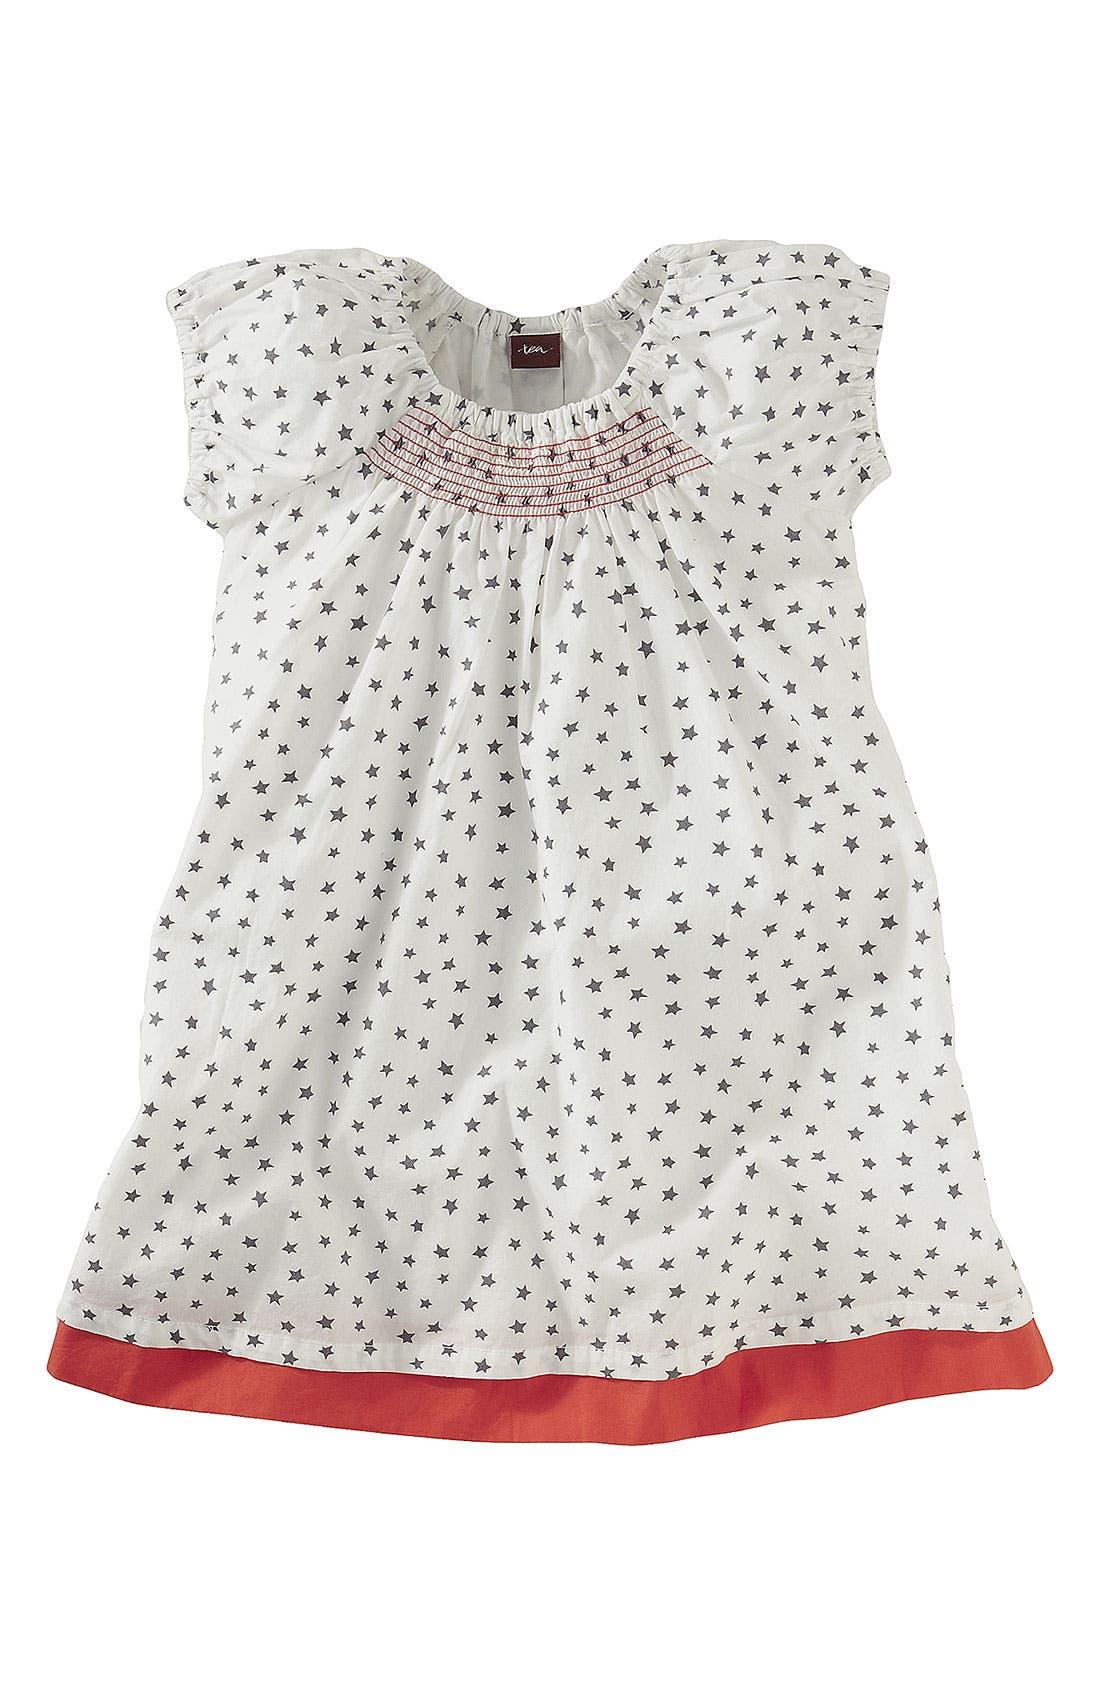 Alternate Image 1 Selected - Tea Collection Smocked Dress (Infant)